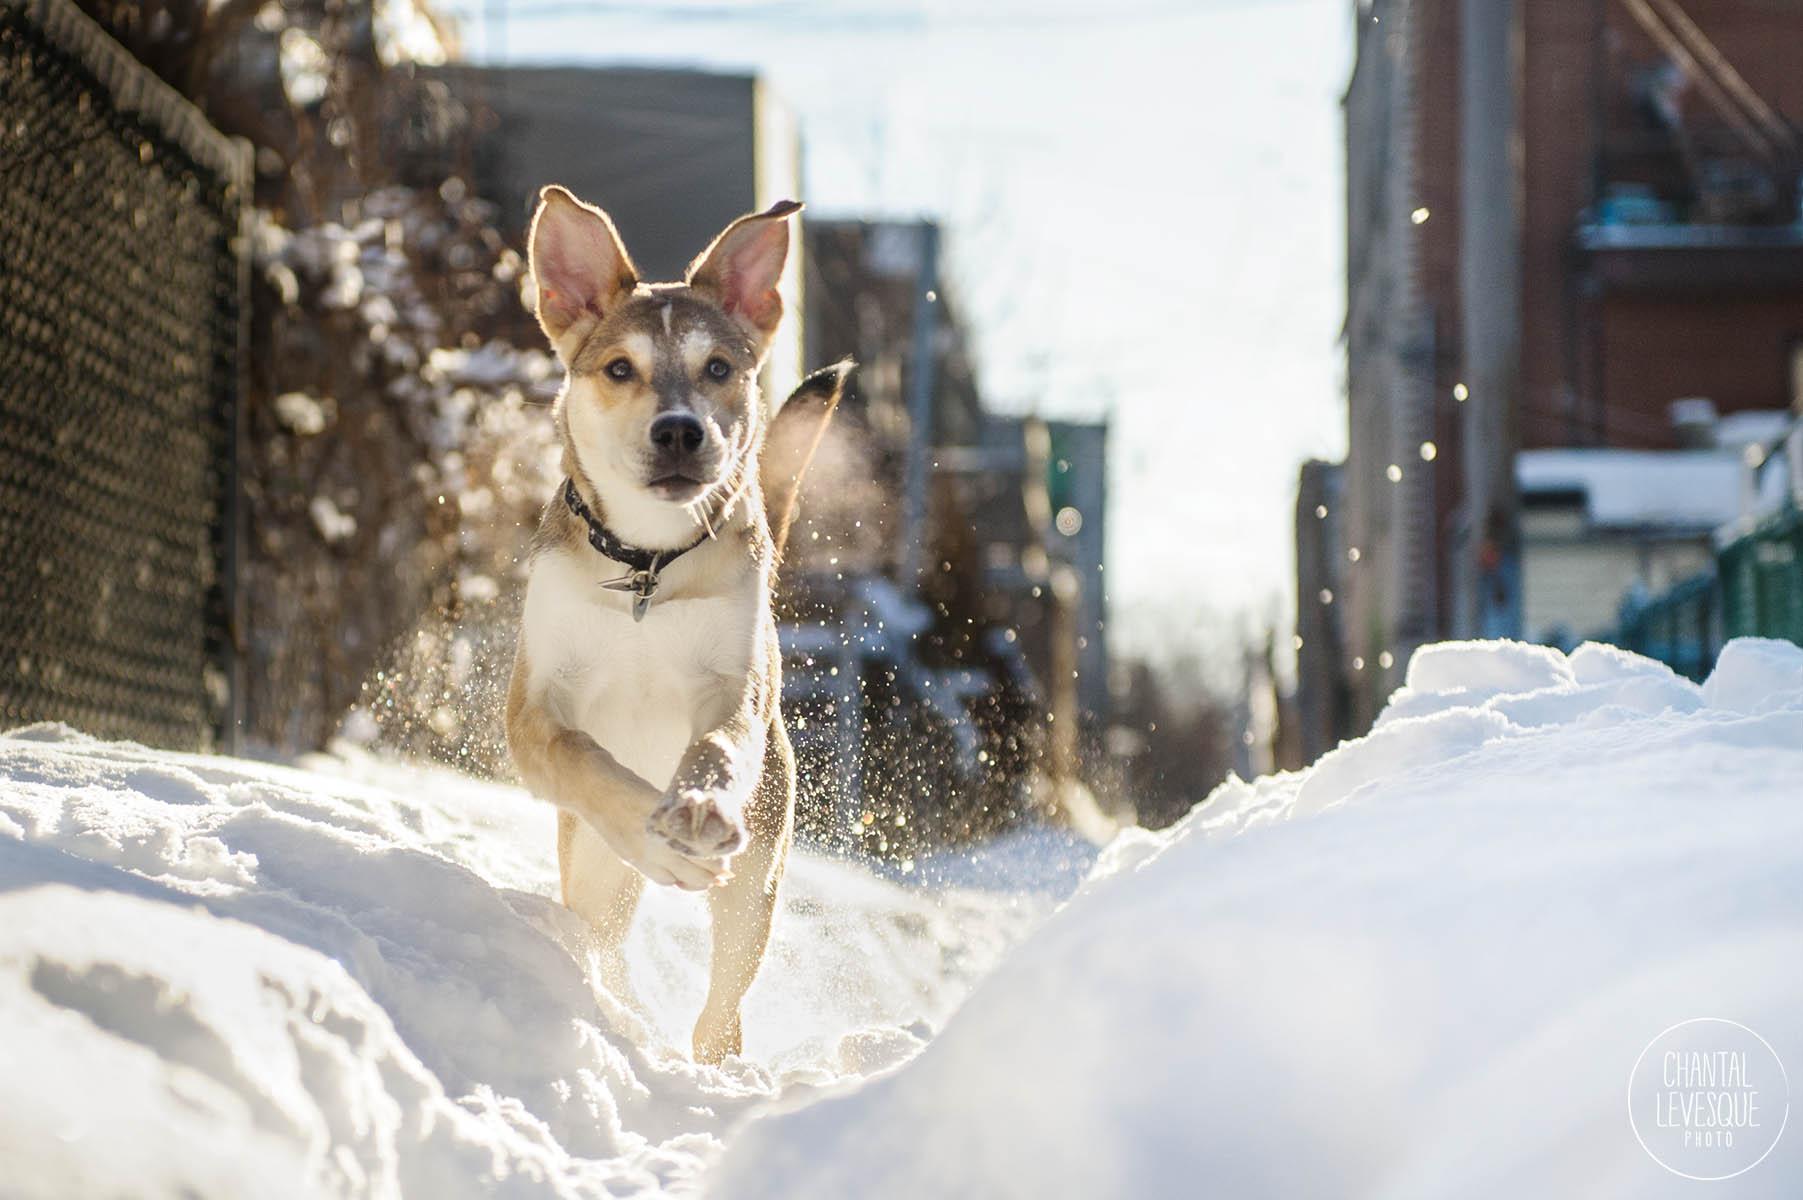 puppy-running-snow.jpg